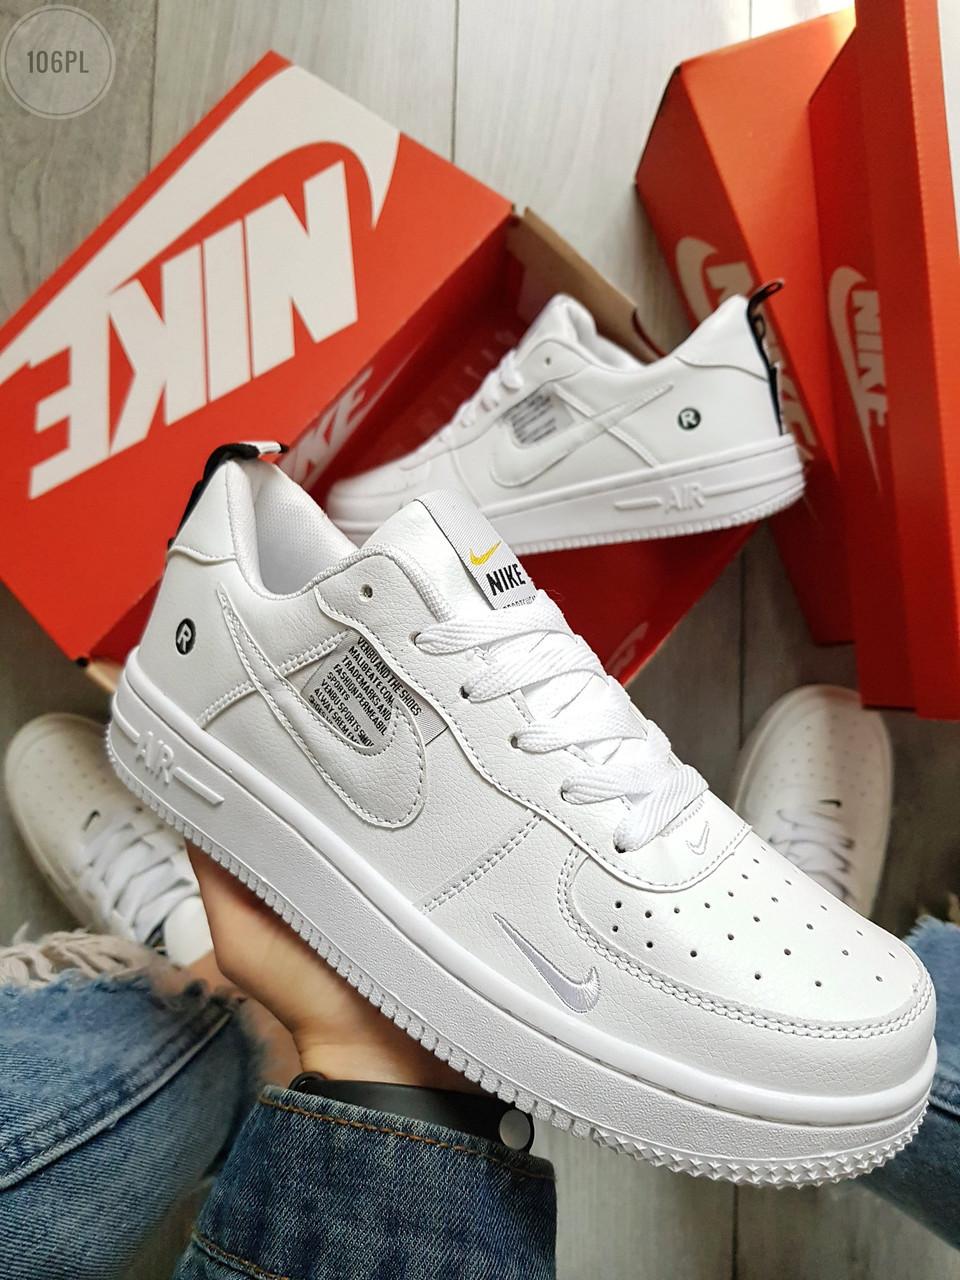 Мужские кроссовки Nike Air Force 19 Low Total White (р. 40-44) Белые